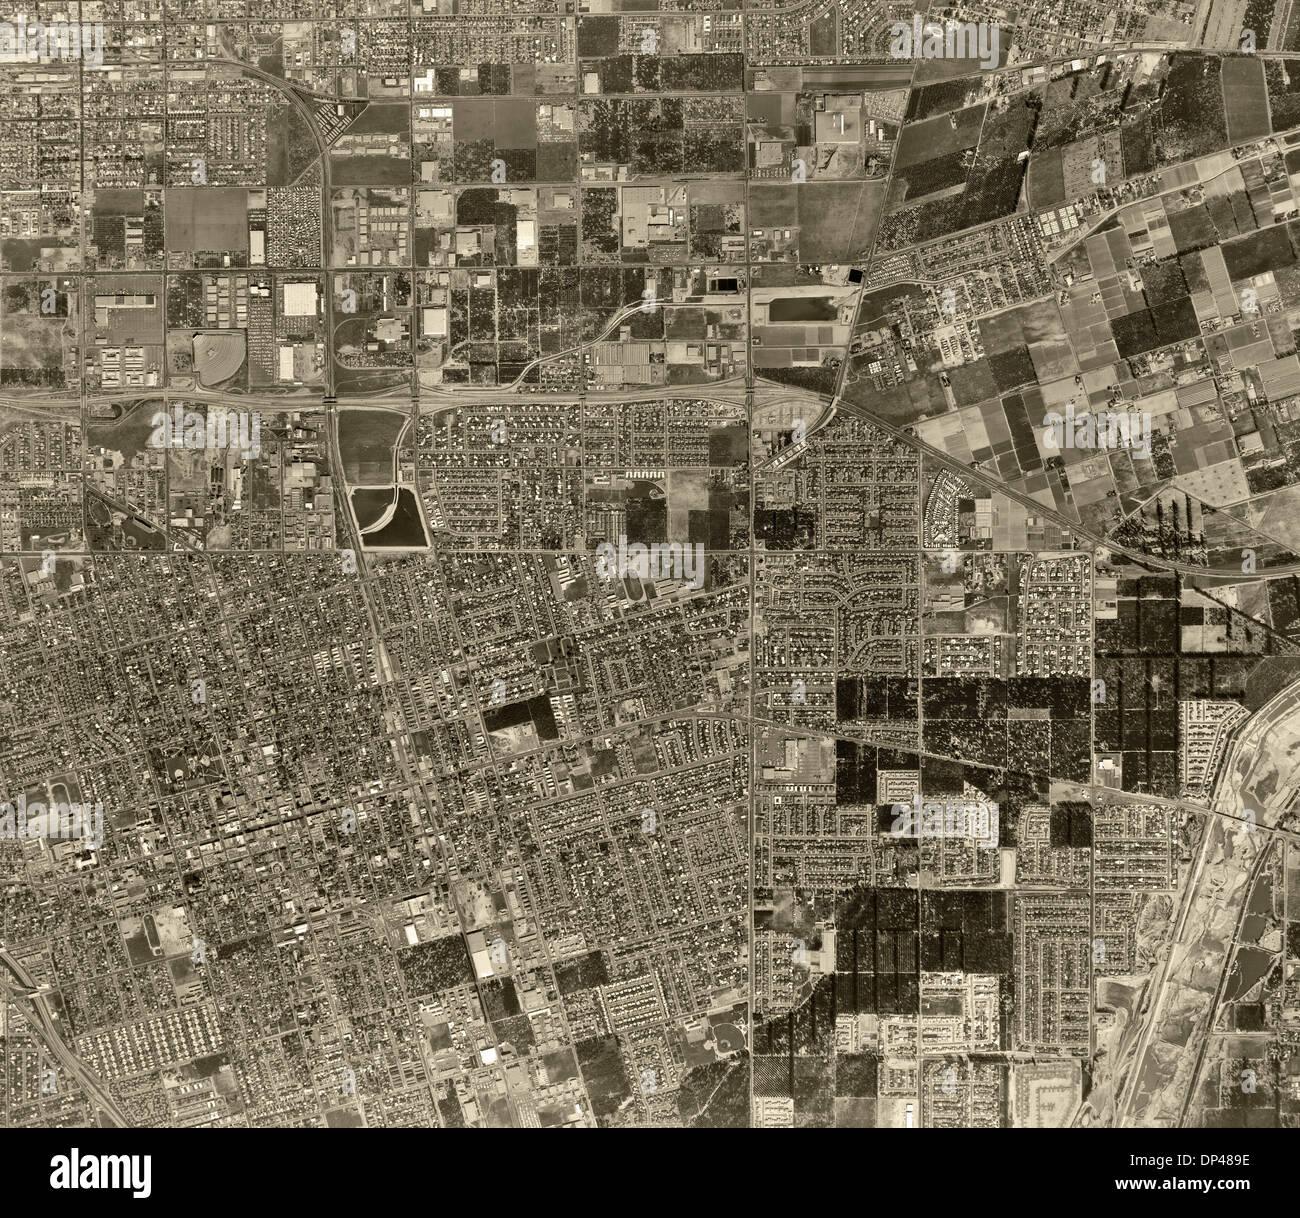 historical aerial photograph Anaheim, California, 1963 - Stock Image